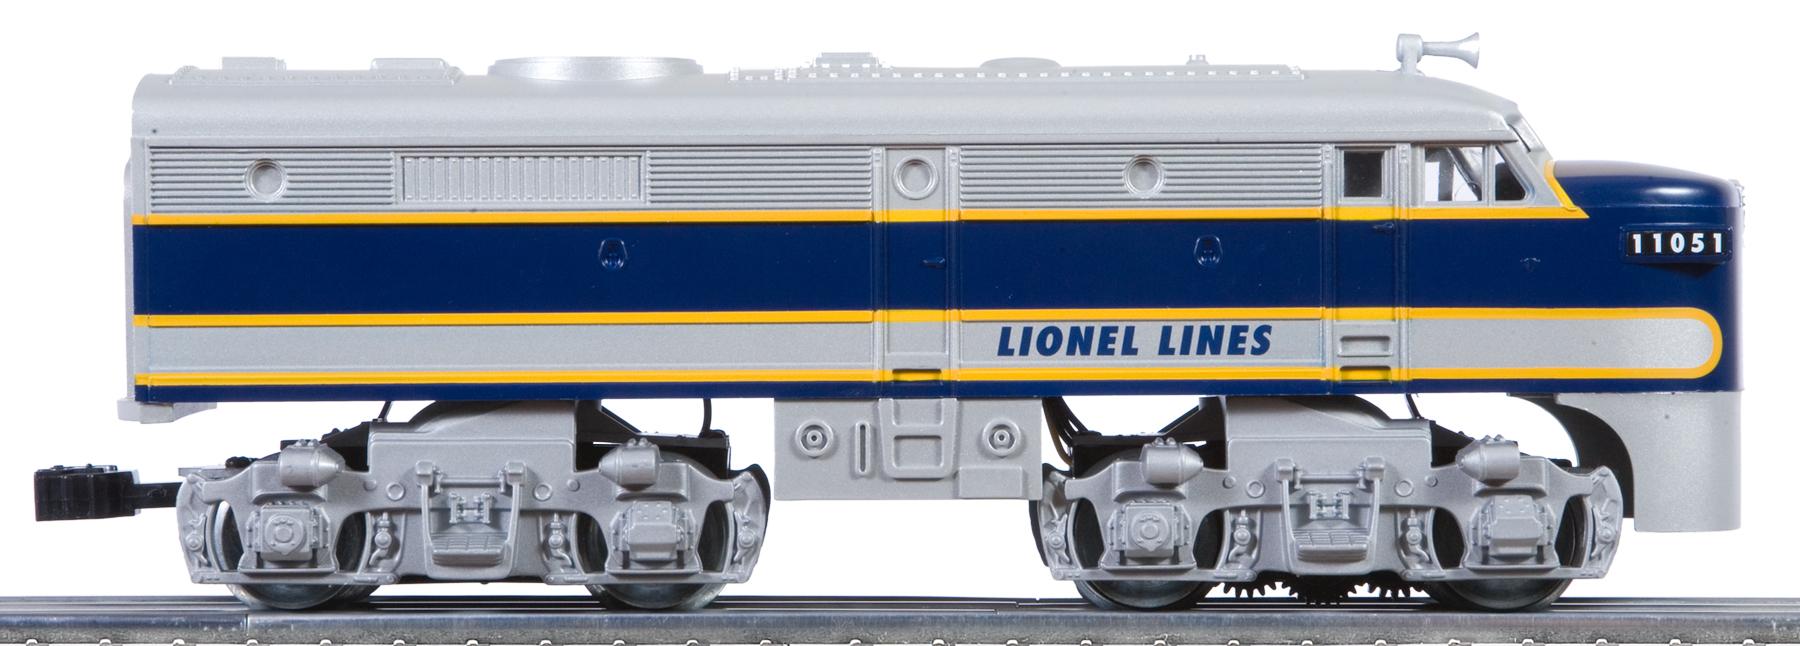 Lionel Lines Conventional Alco Fa Diesel 11051